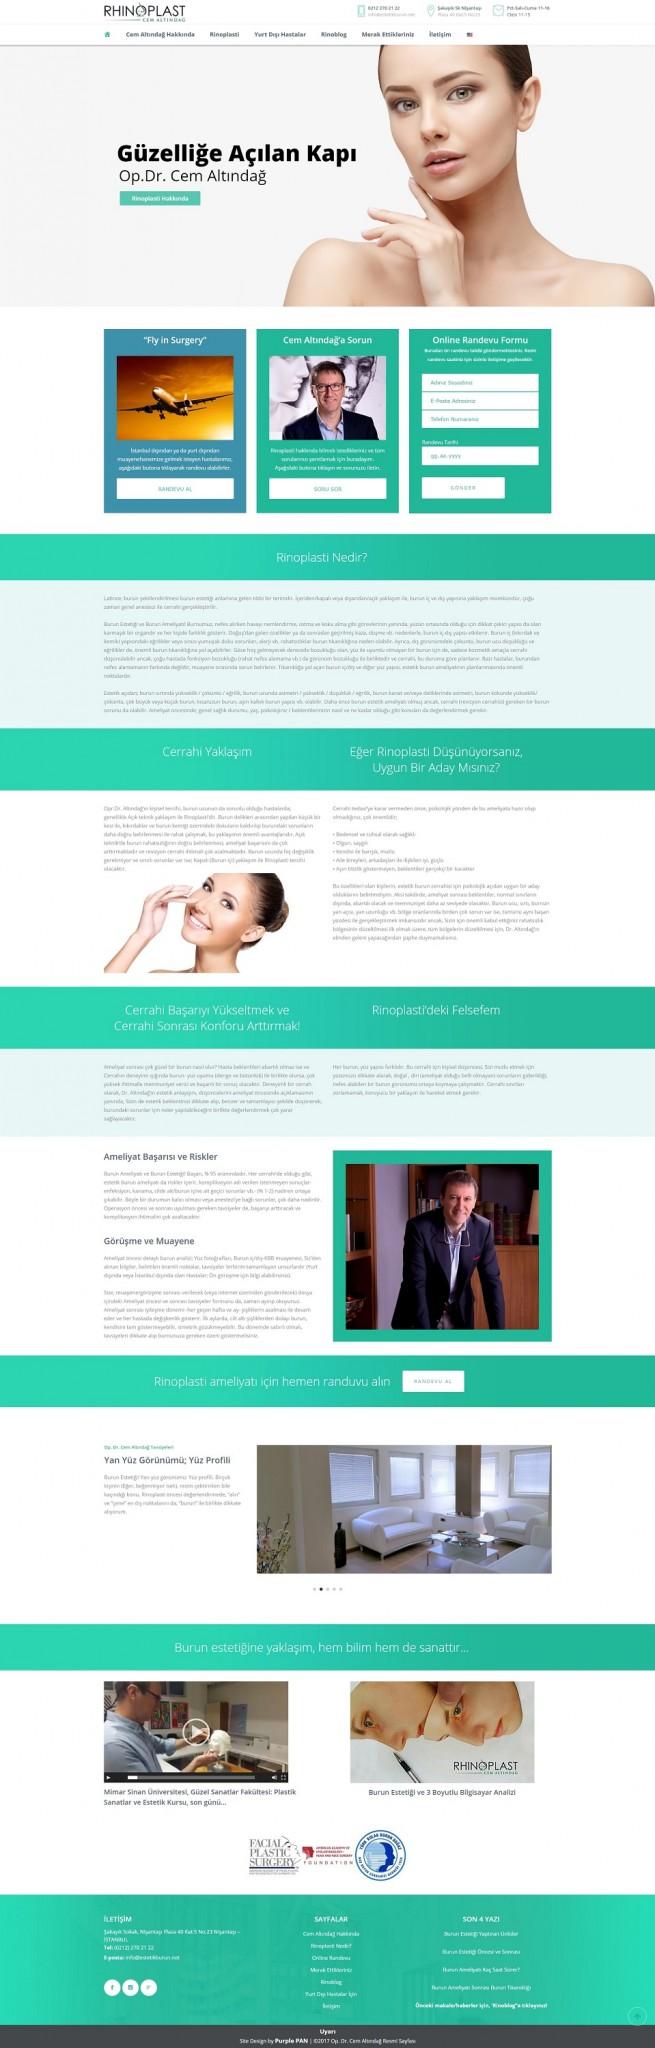 Rhinoplast Website